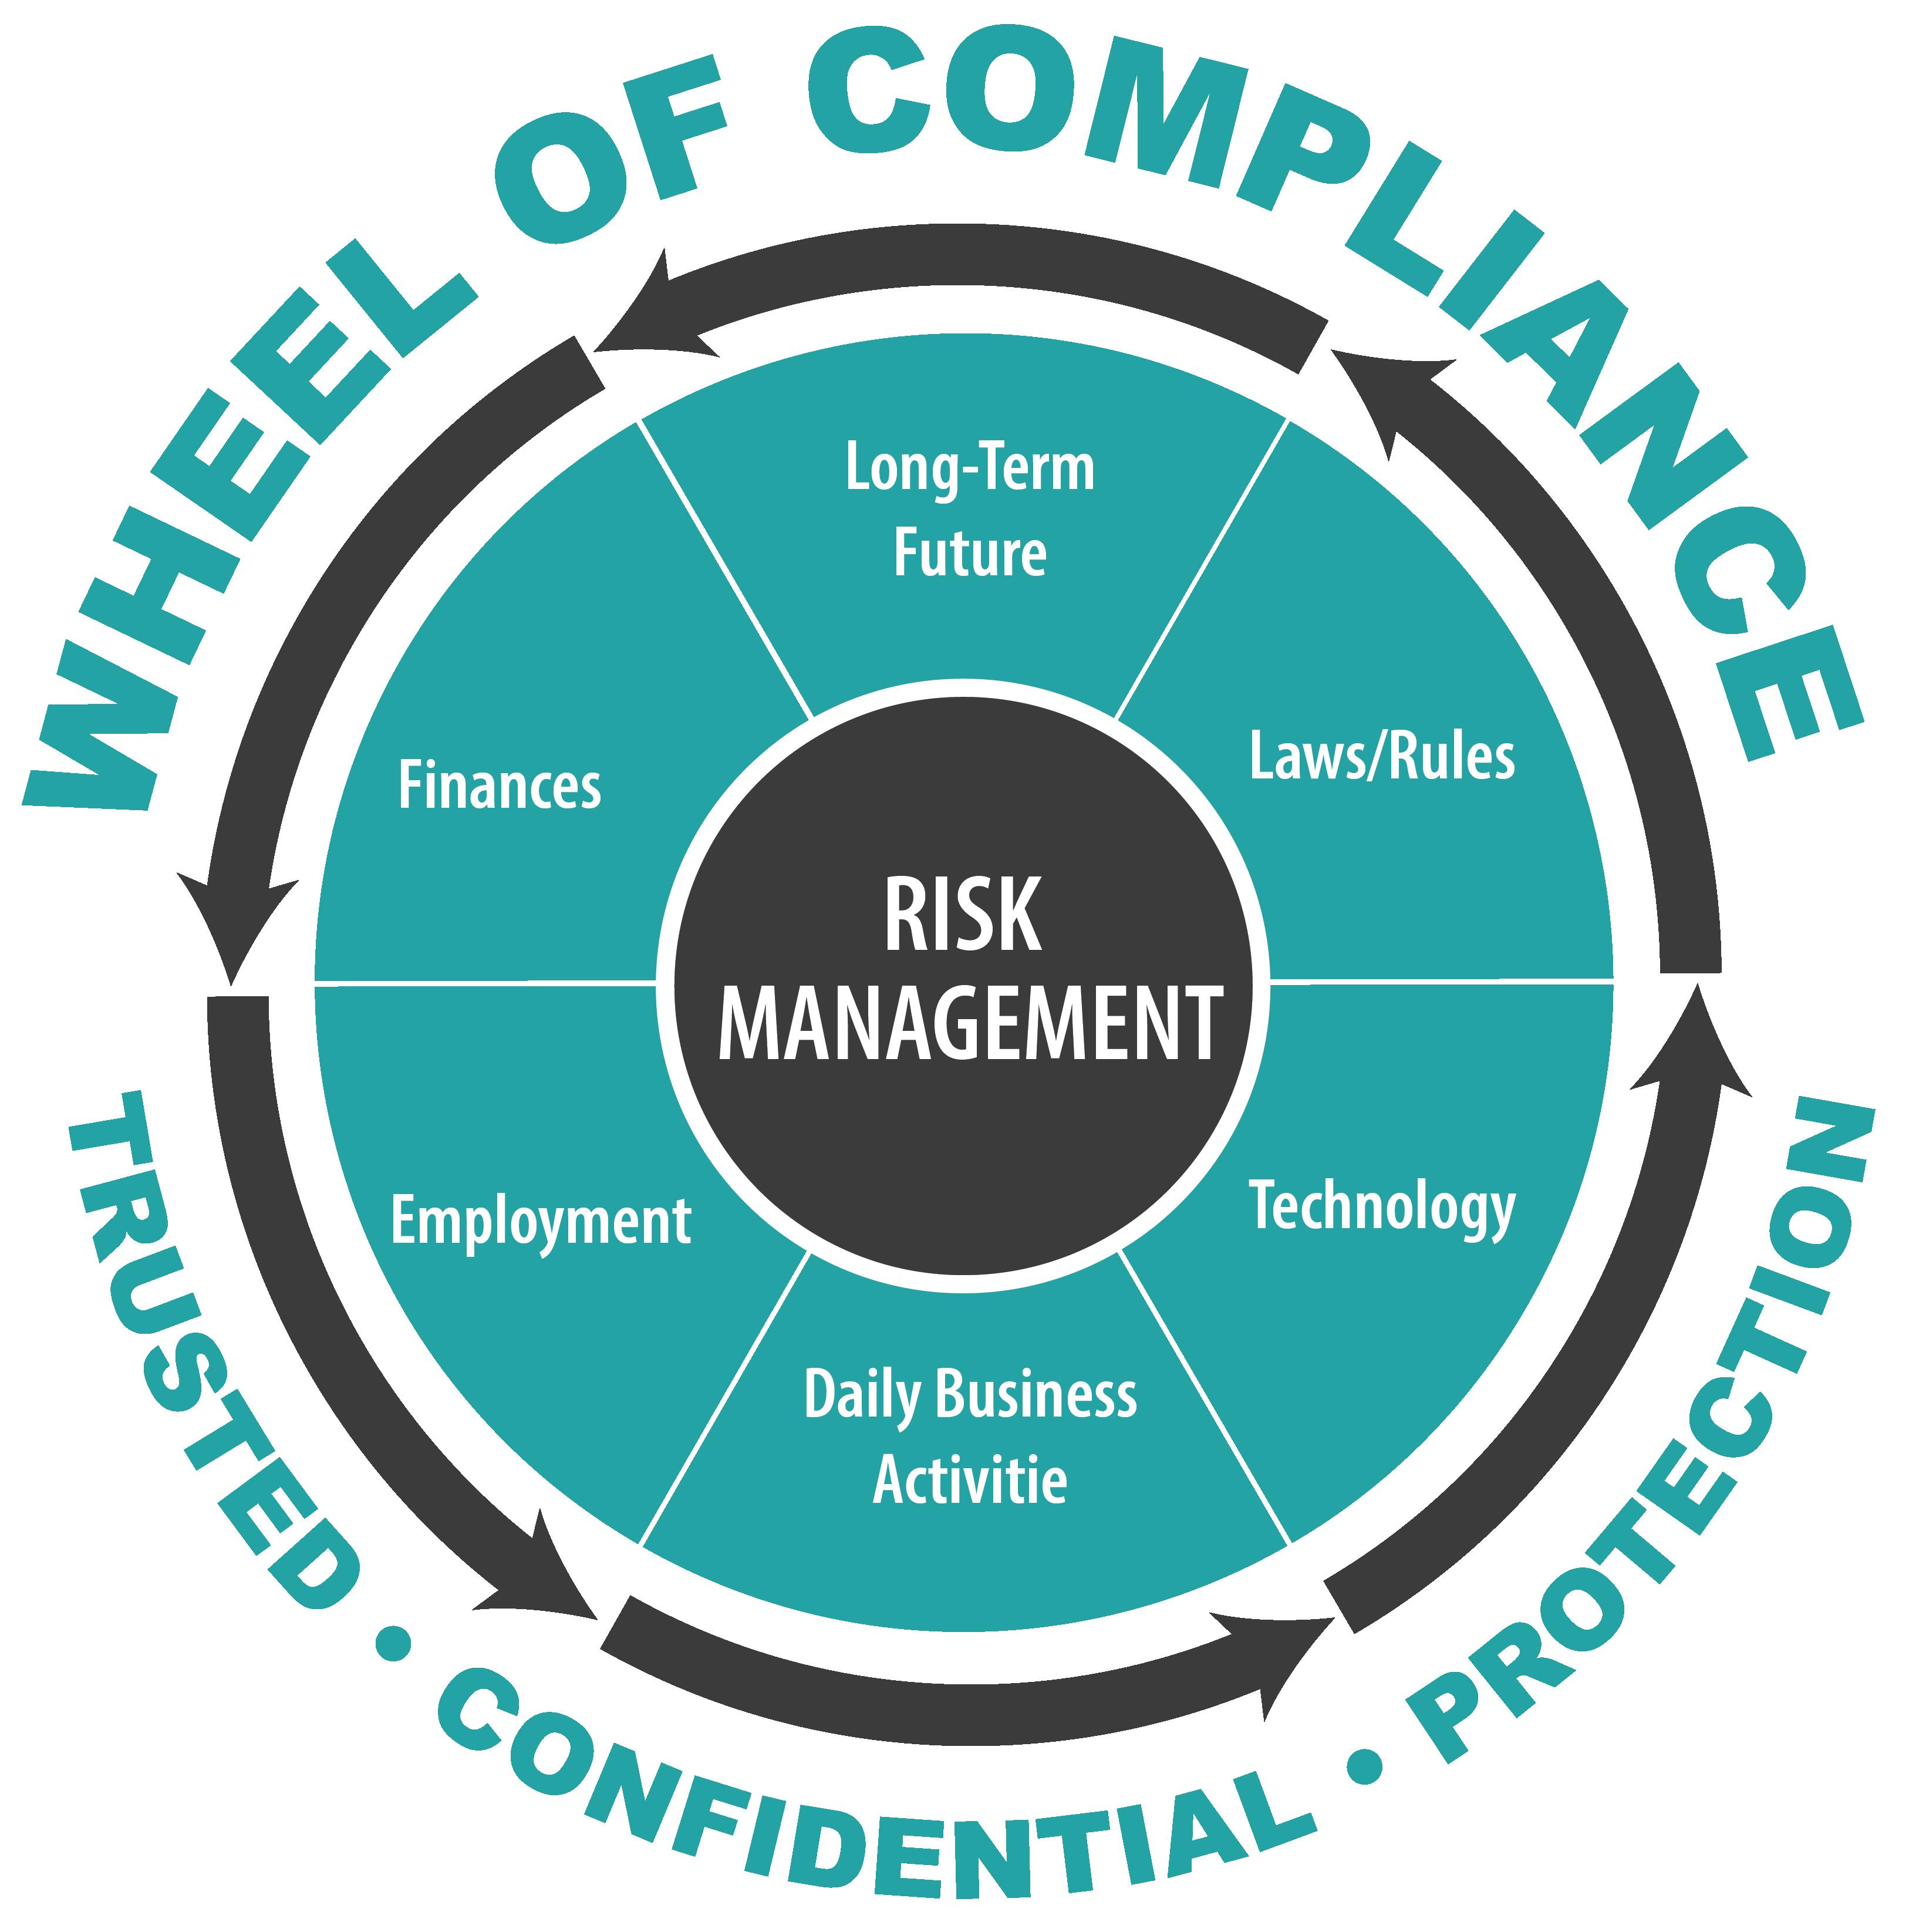 Wheel_of_Compliance_2020